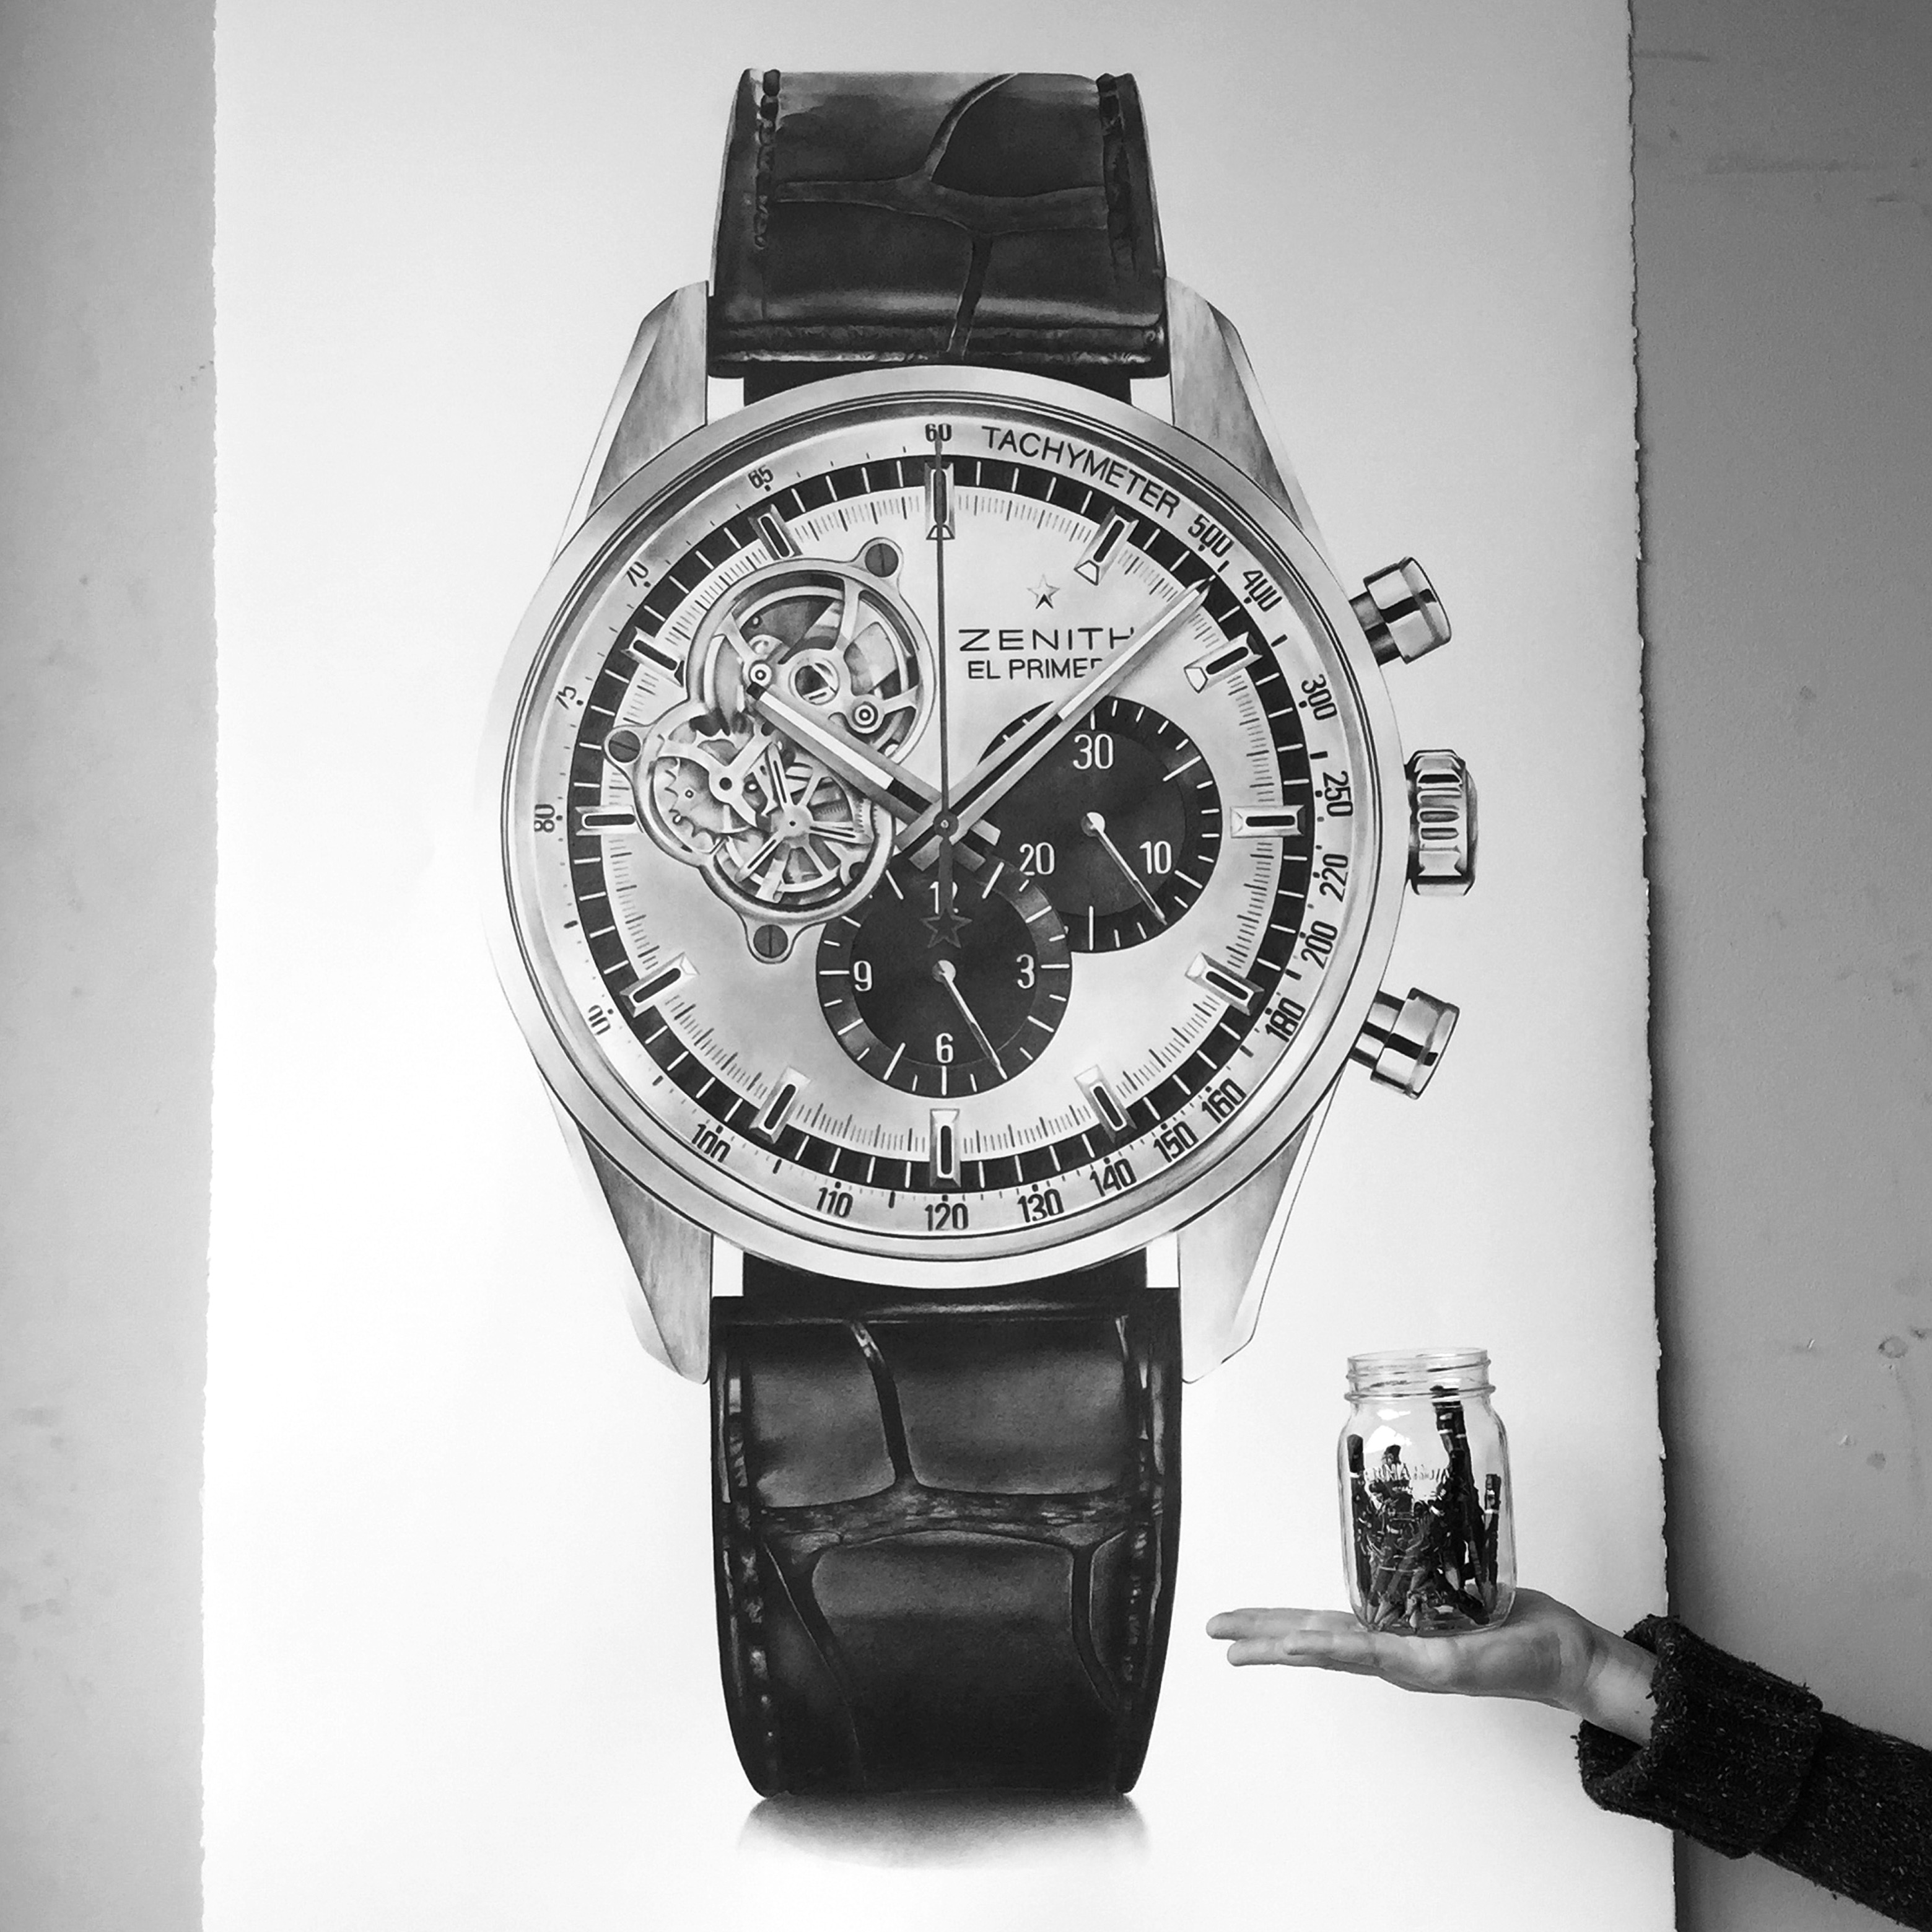 Zenith-El-Primero-JKAI-Timepieces-Julie-Kraulis